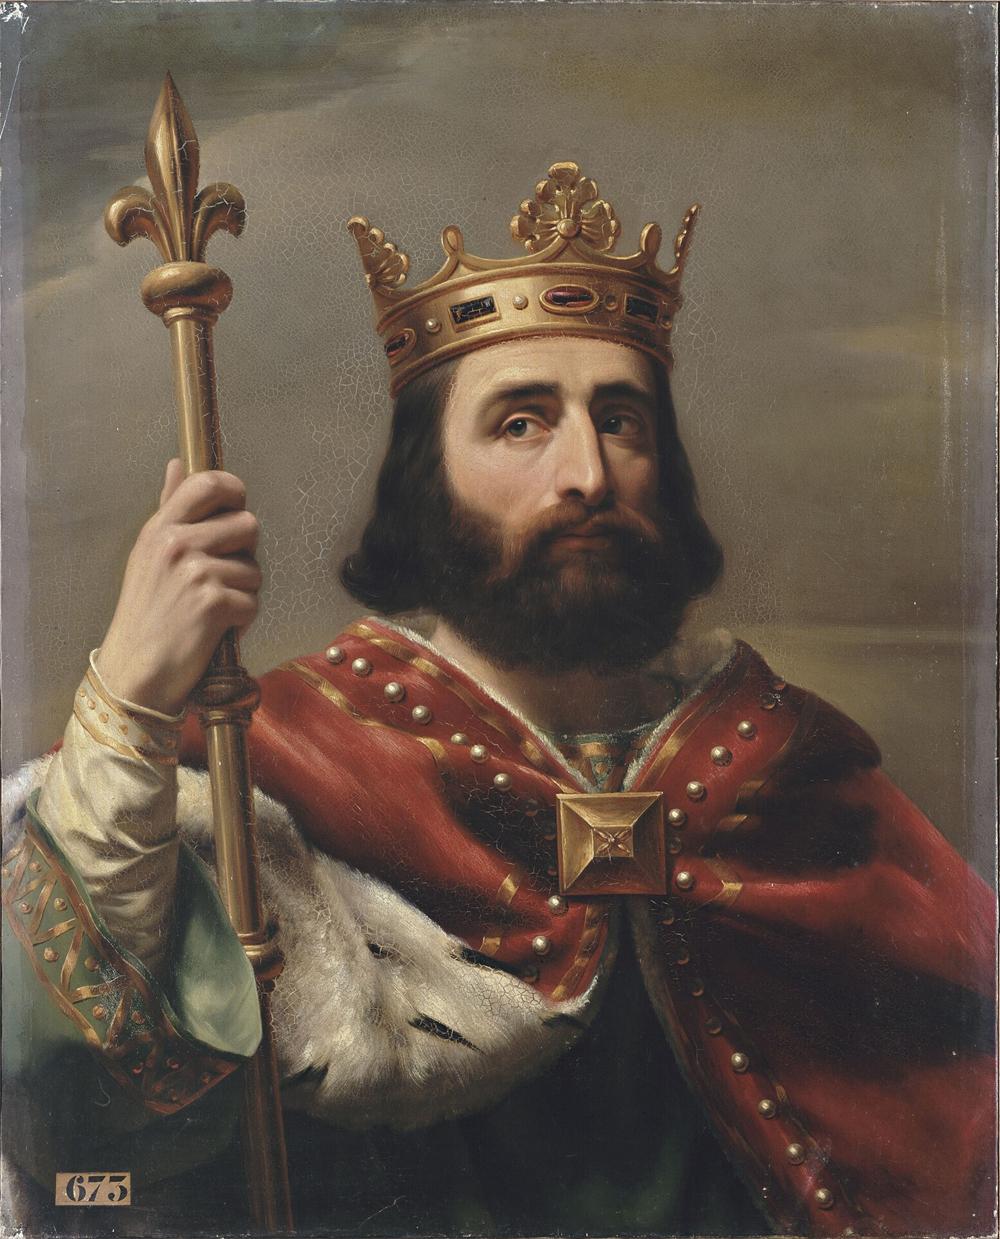 Пипин Короткий, портрет изгалереи «Короли Франции», 1837-38гг.